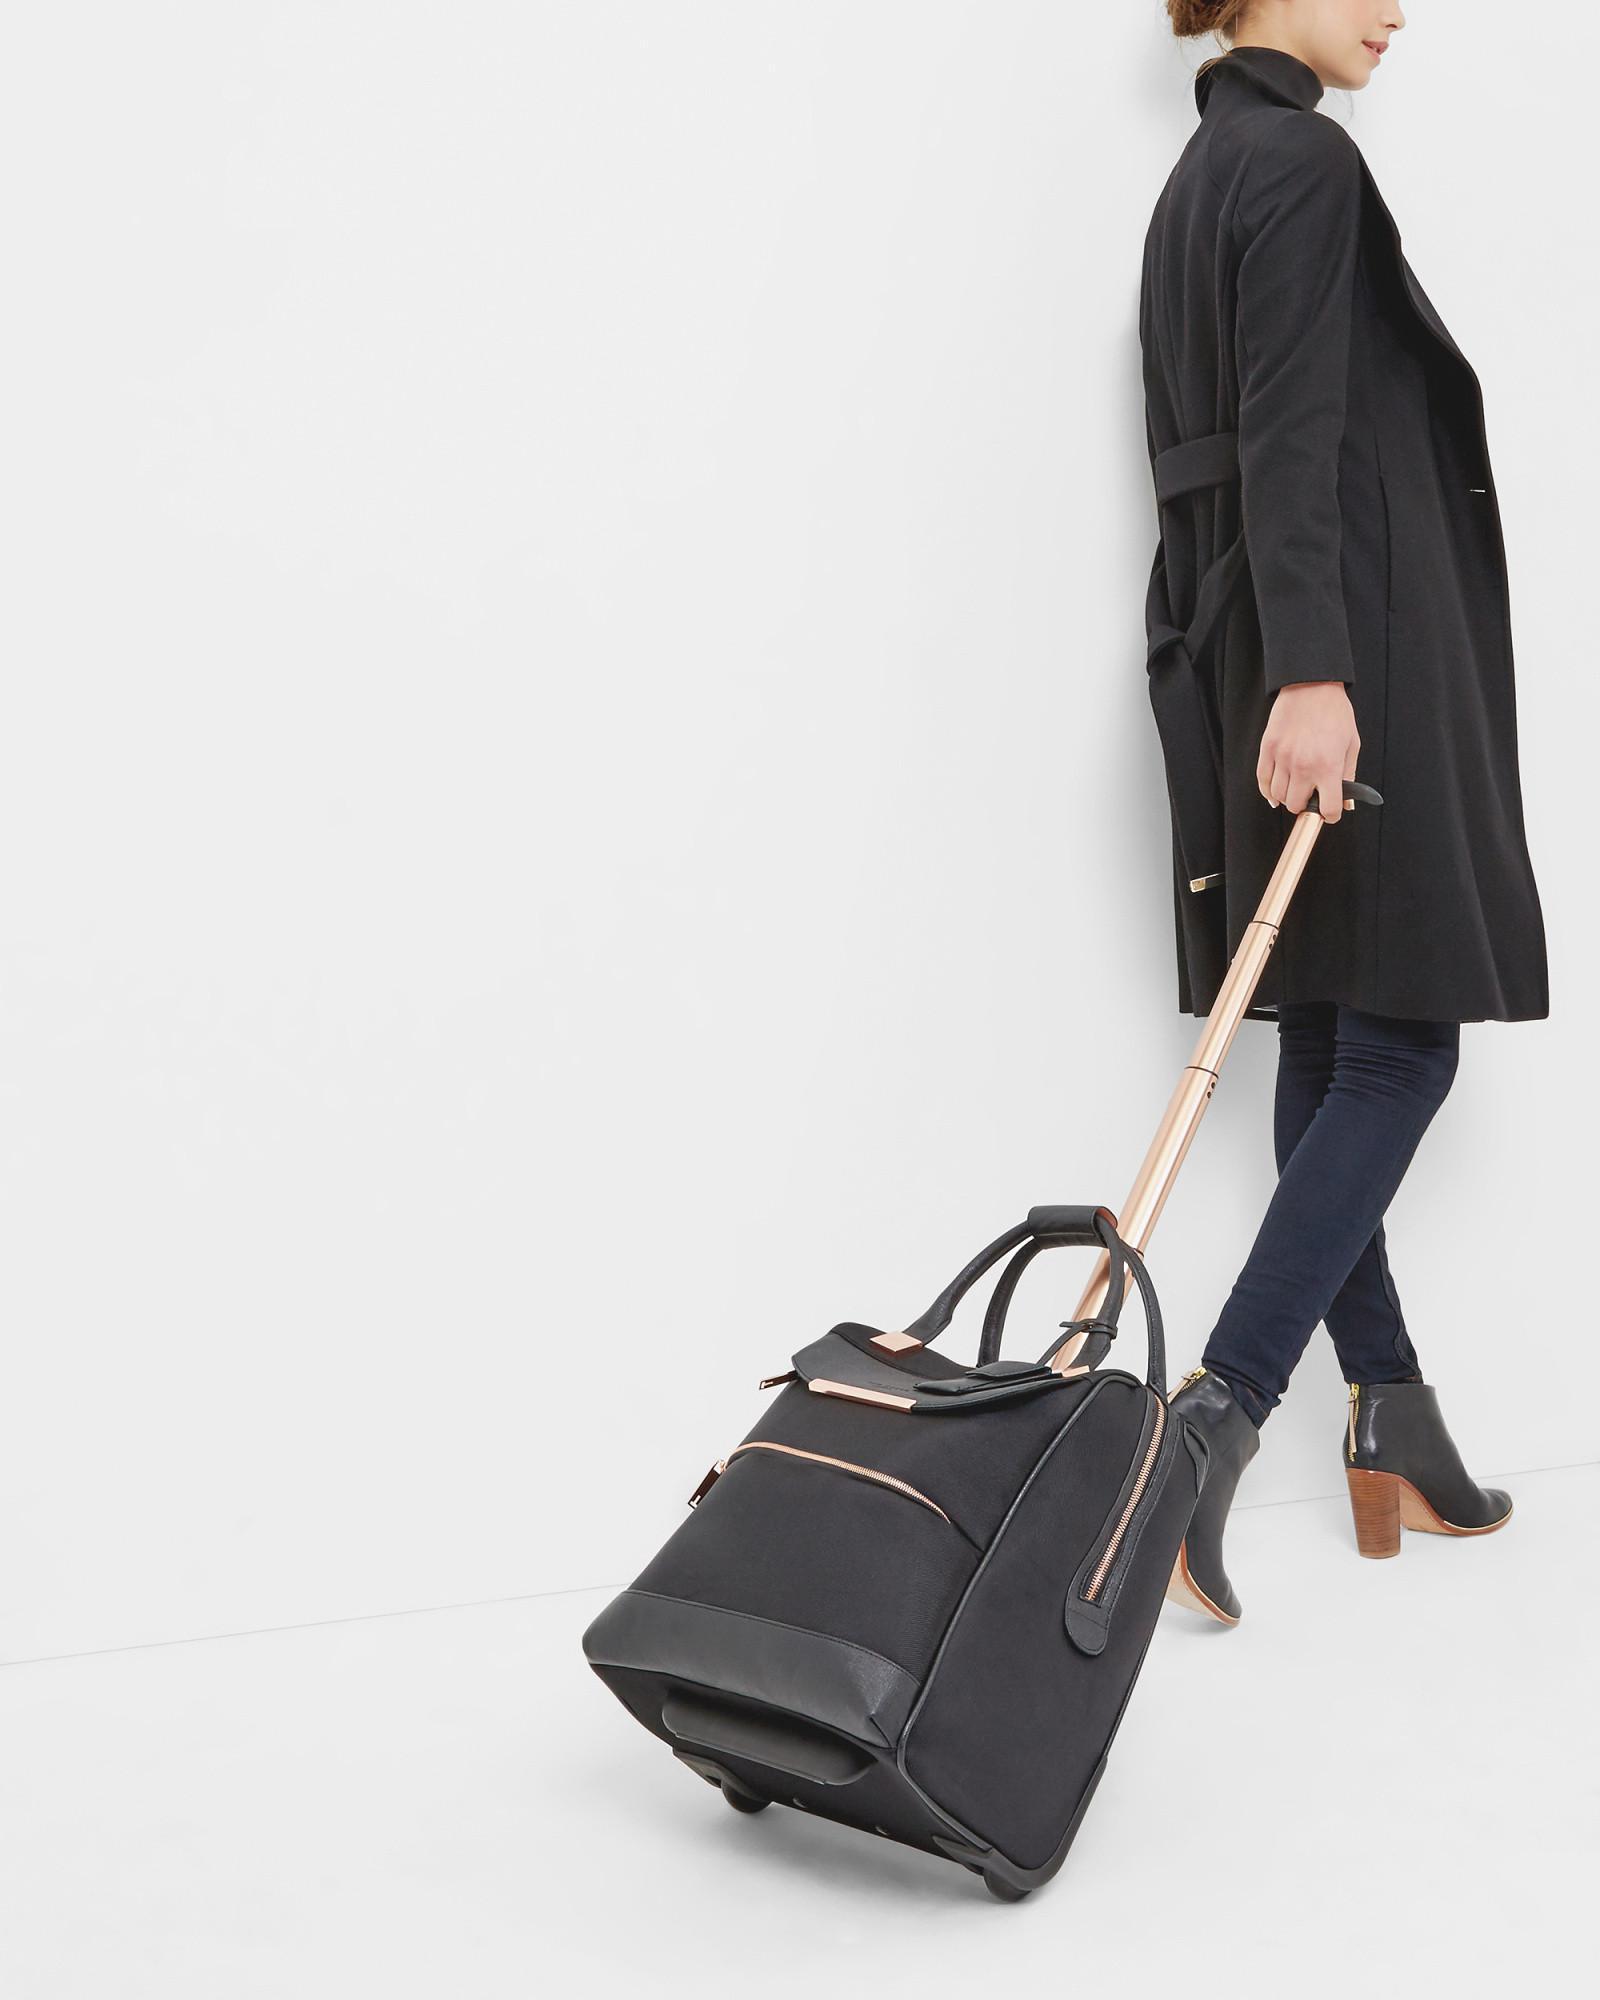 c1a7b9b893d3 Lyst - Ted Baker Metallic Trim Travel Bag in Black